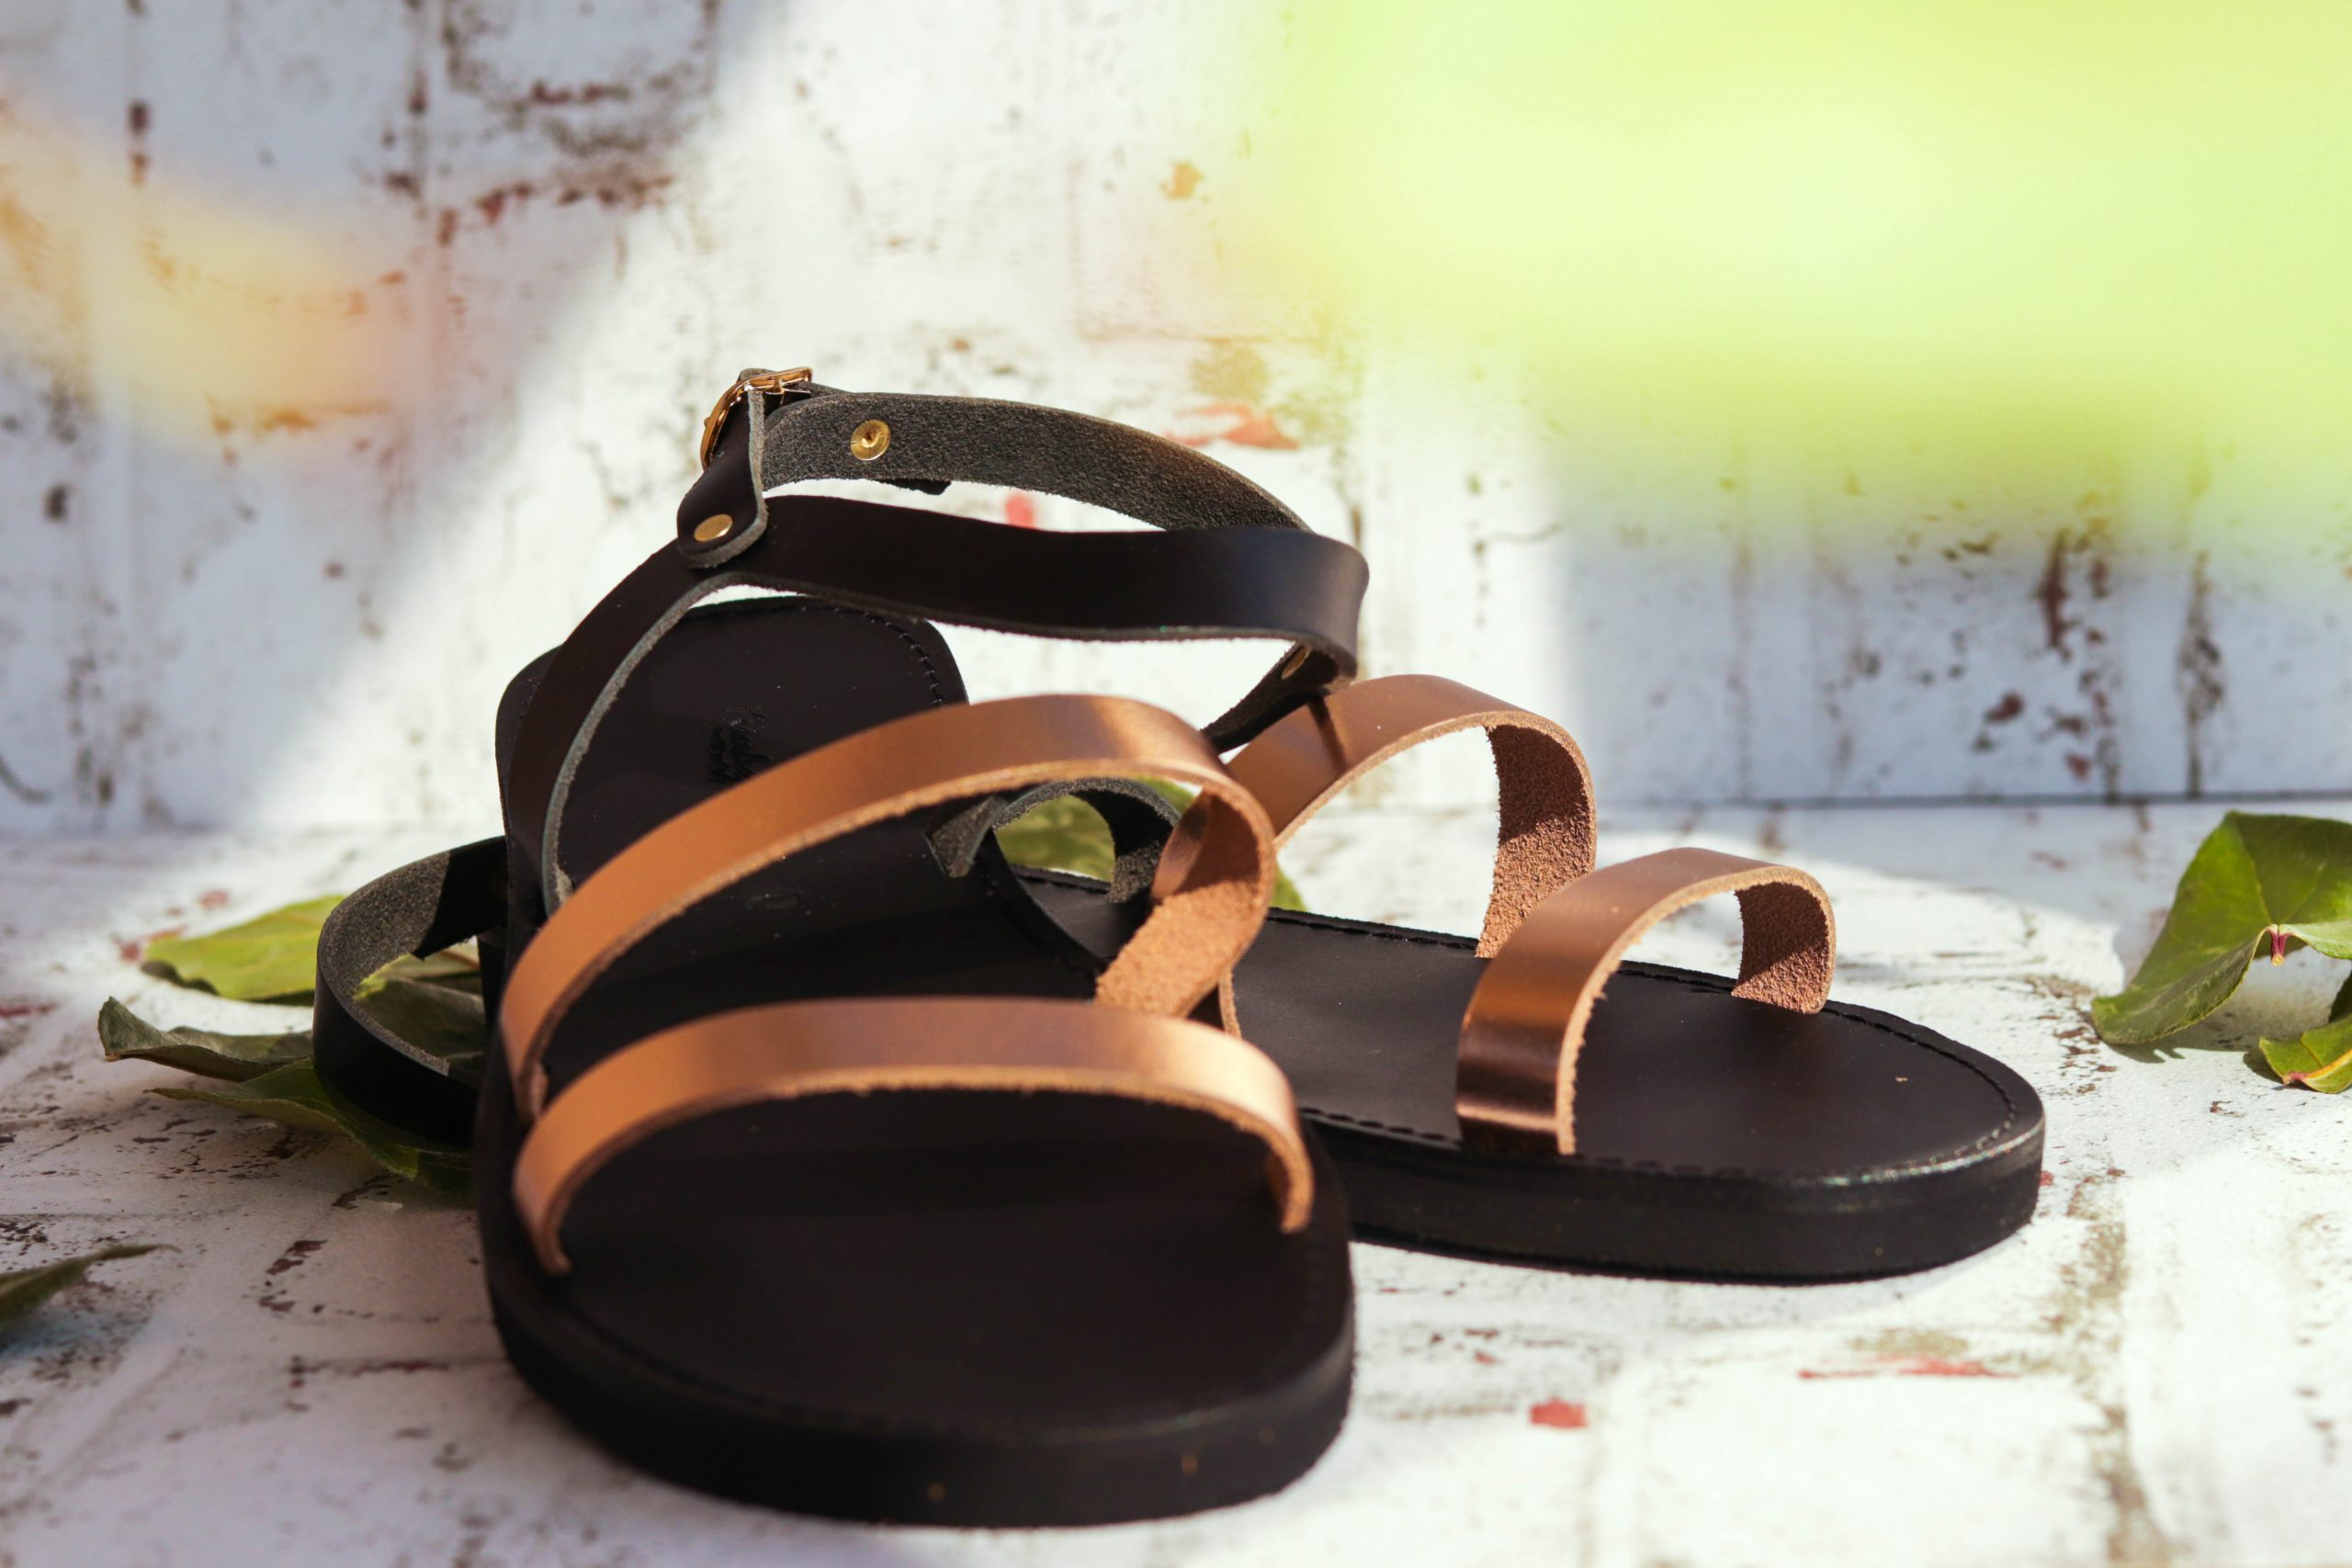 Flache Sandalen FUNKY CHIC, bronze